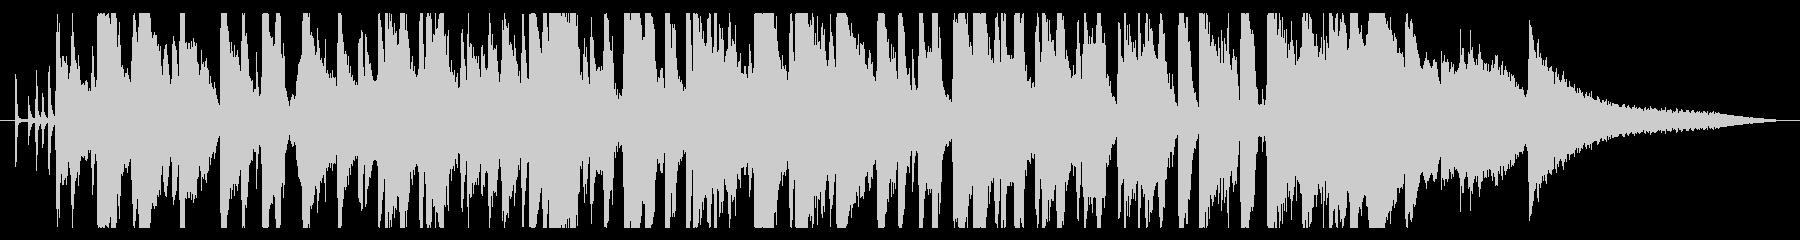 CM30秒ウイスキーのCMなどに最適ですの未再生の波形